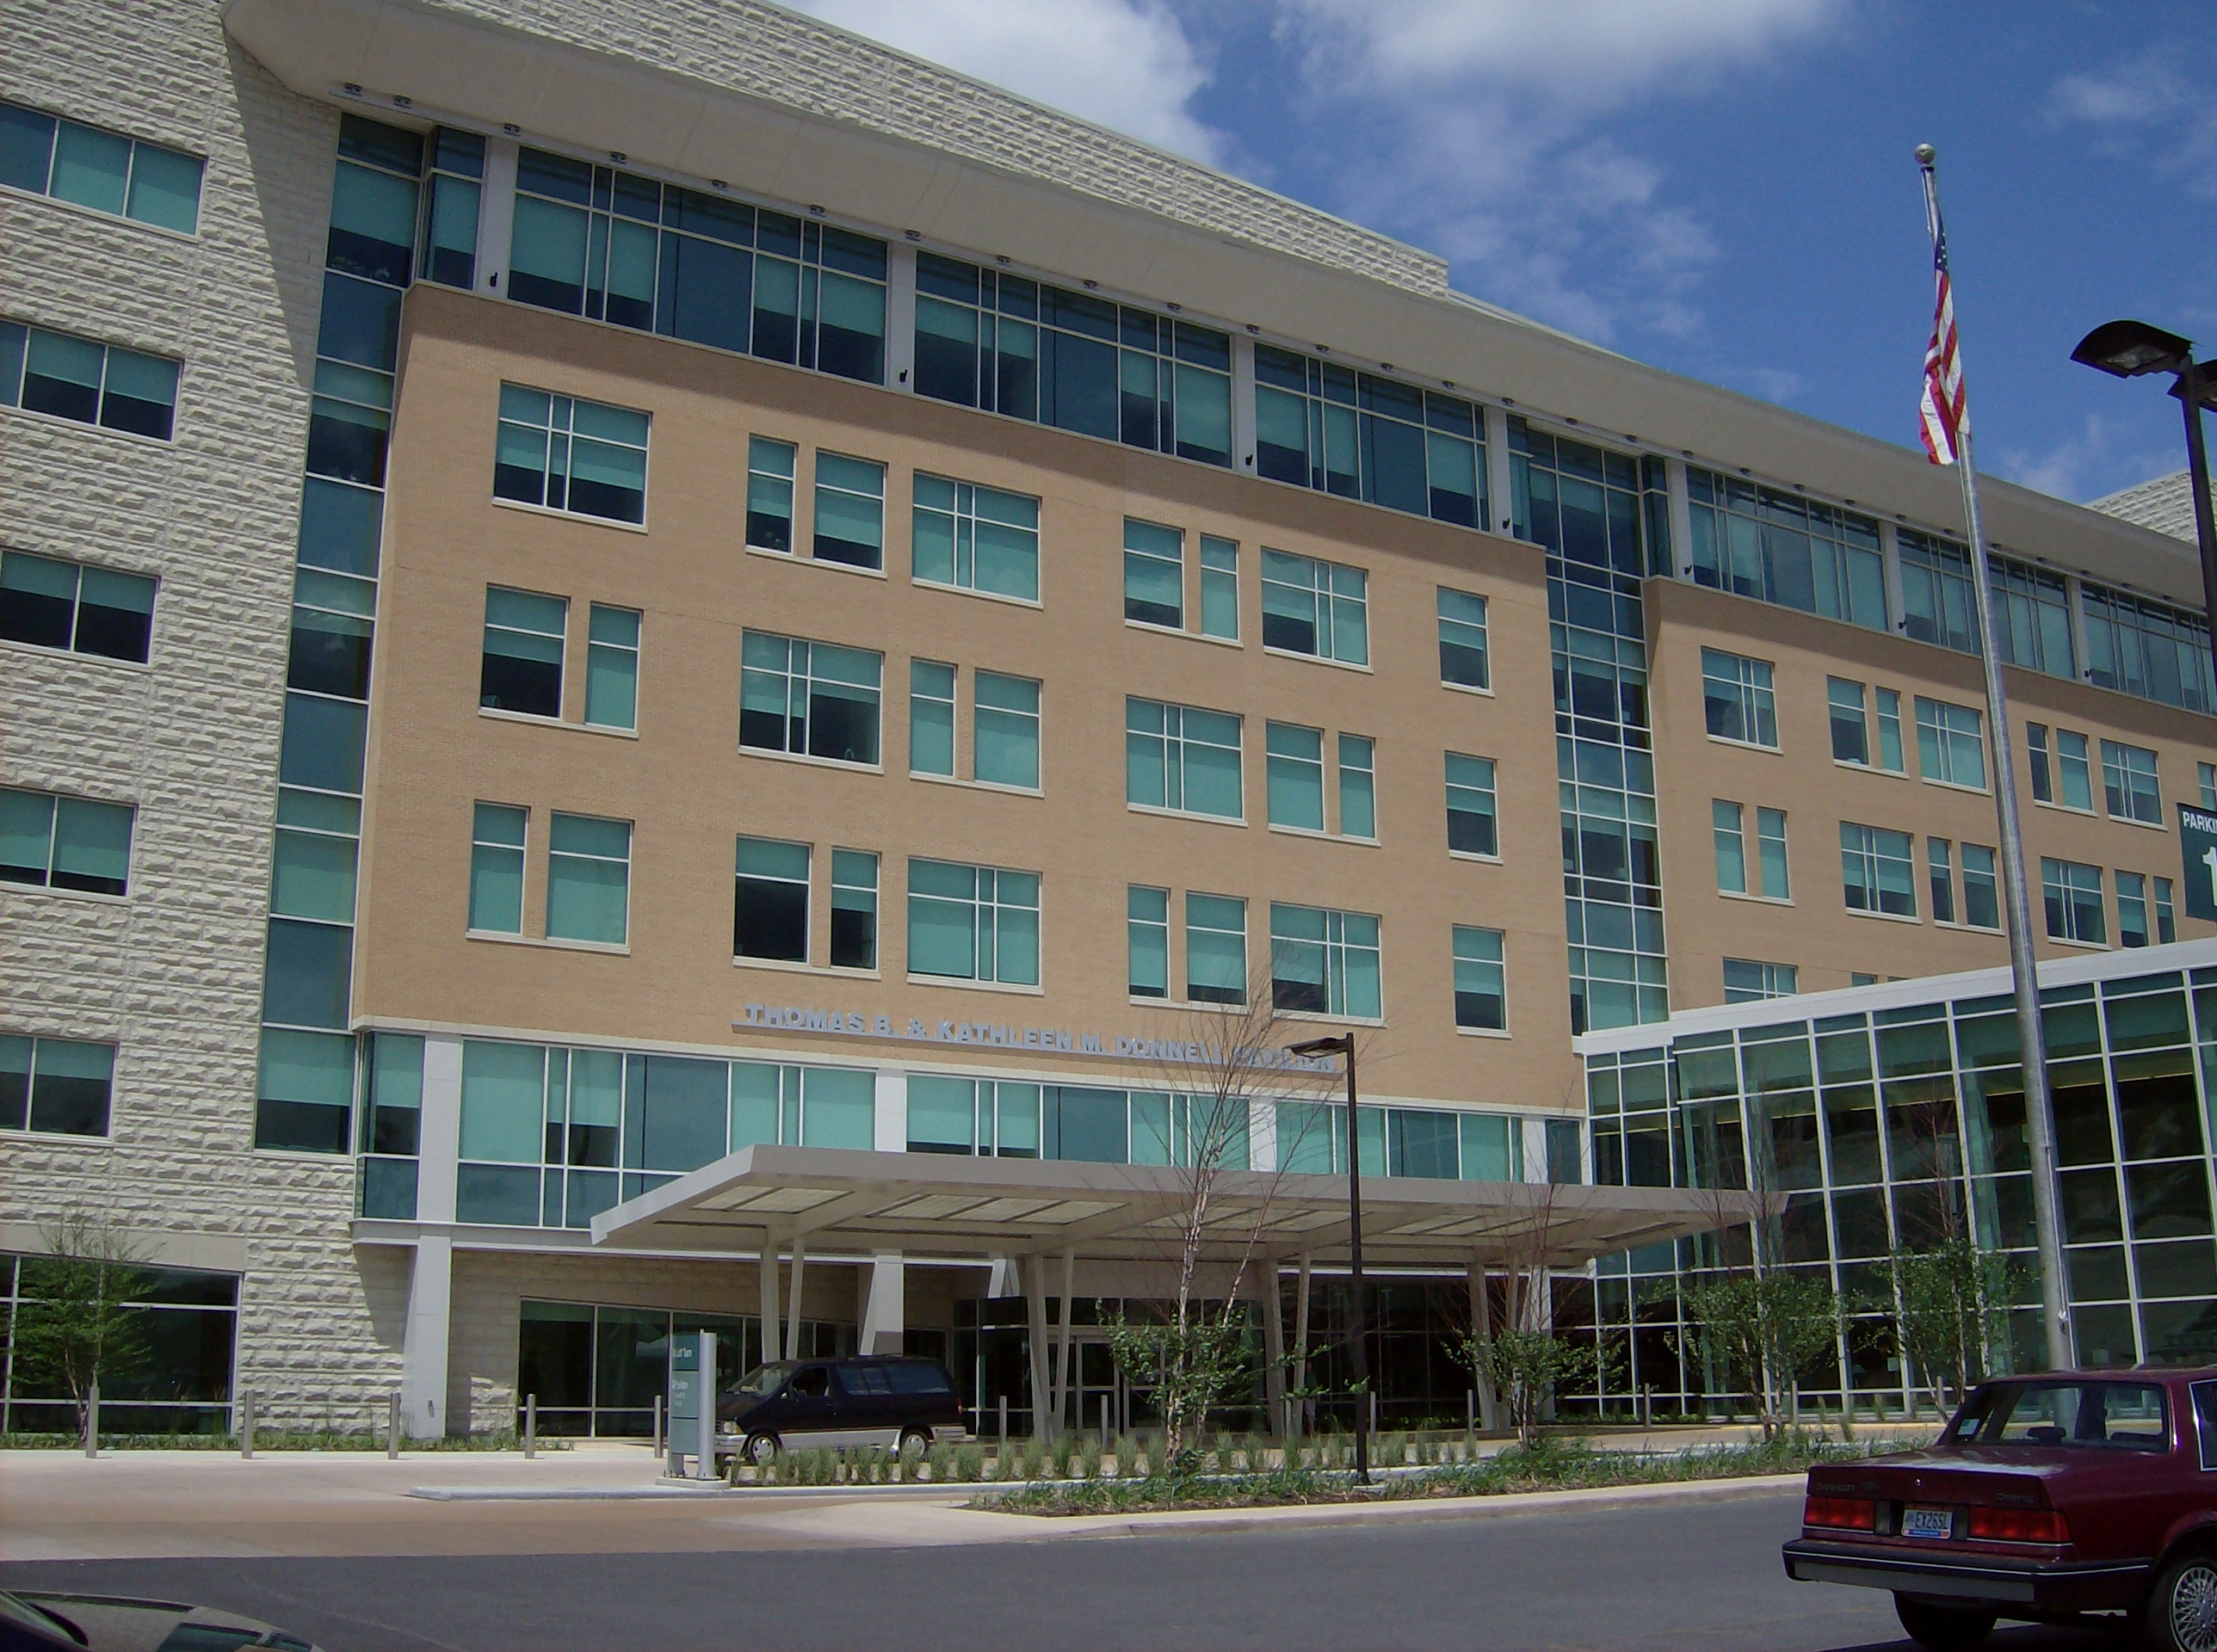 Blanchard valley regional health center fist photos